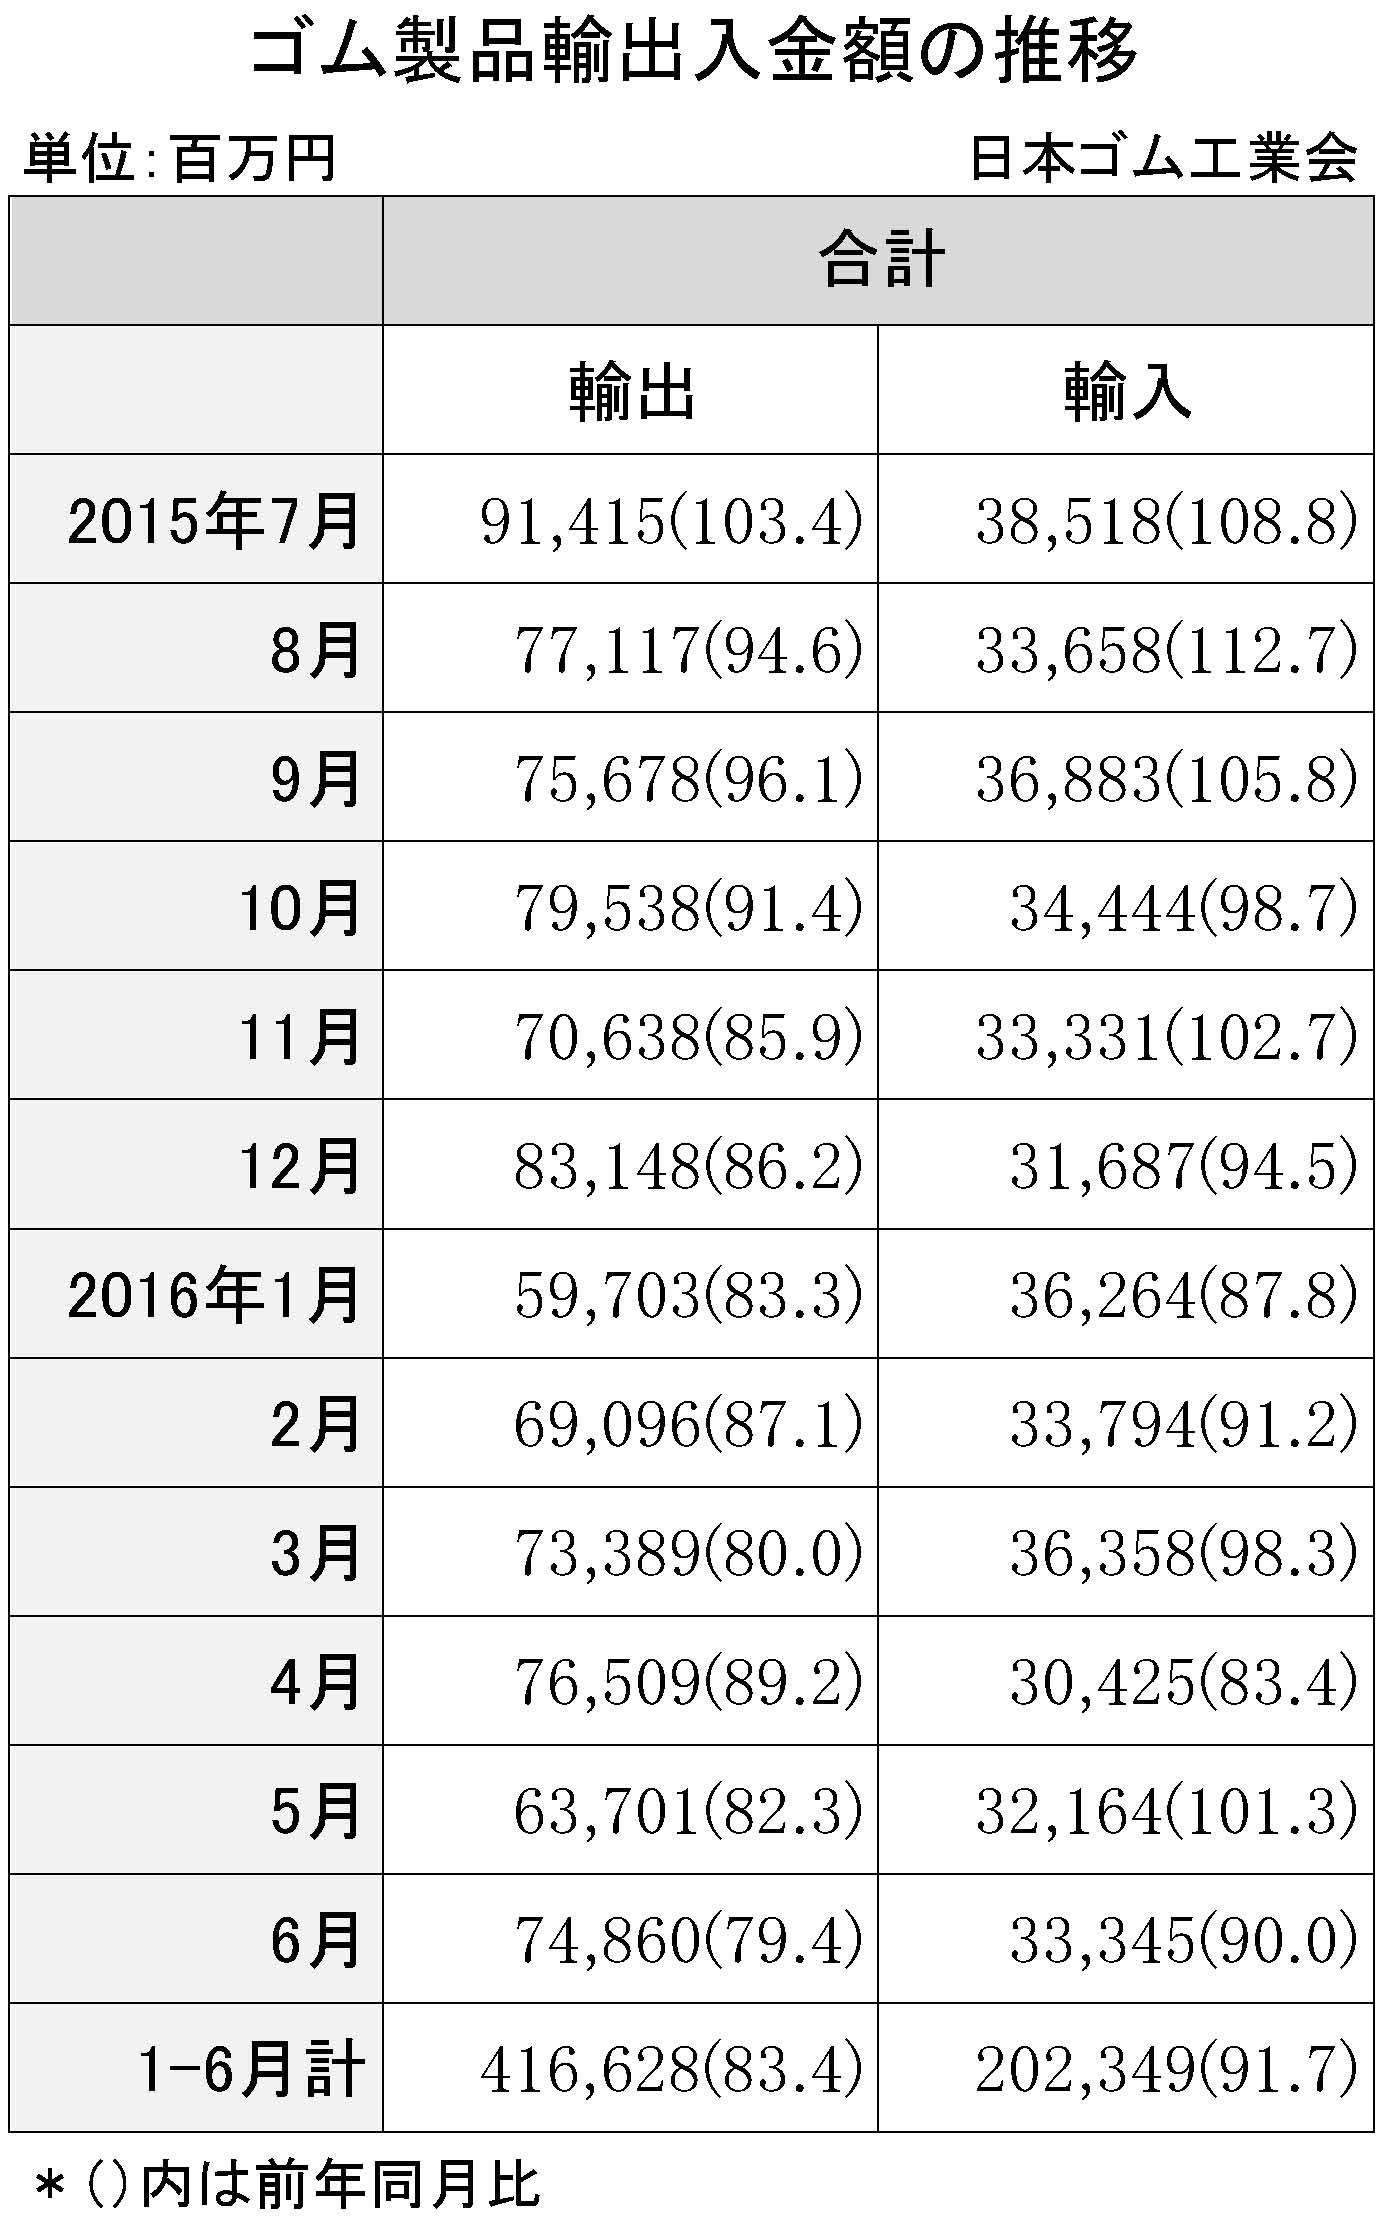 2016年1~6月ゴム製品輸出入金額